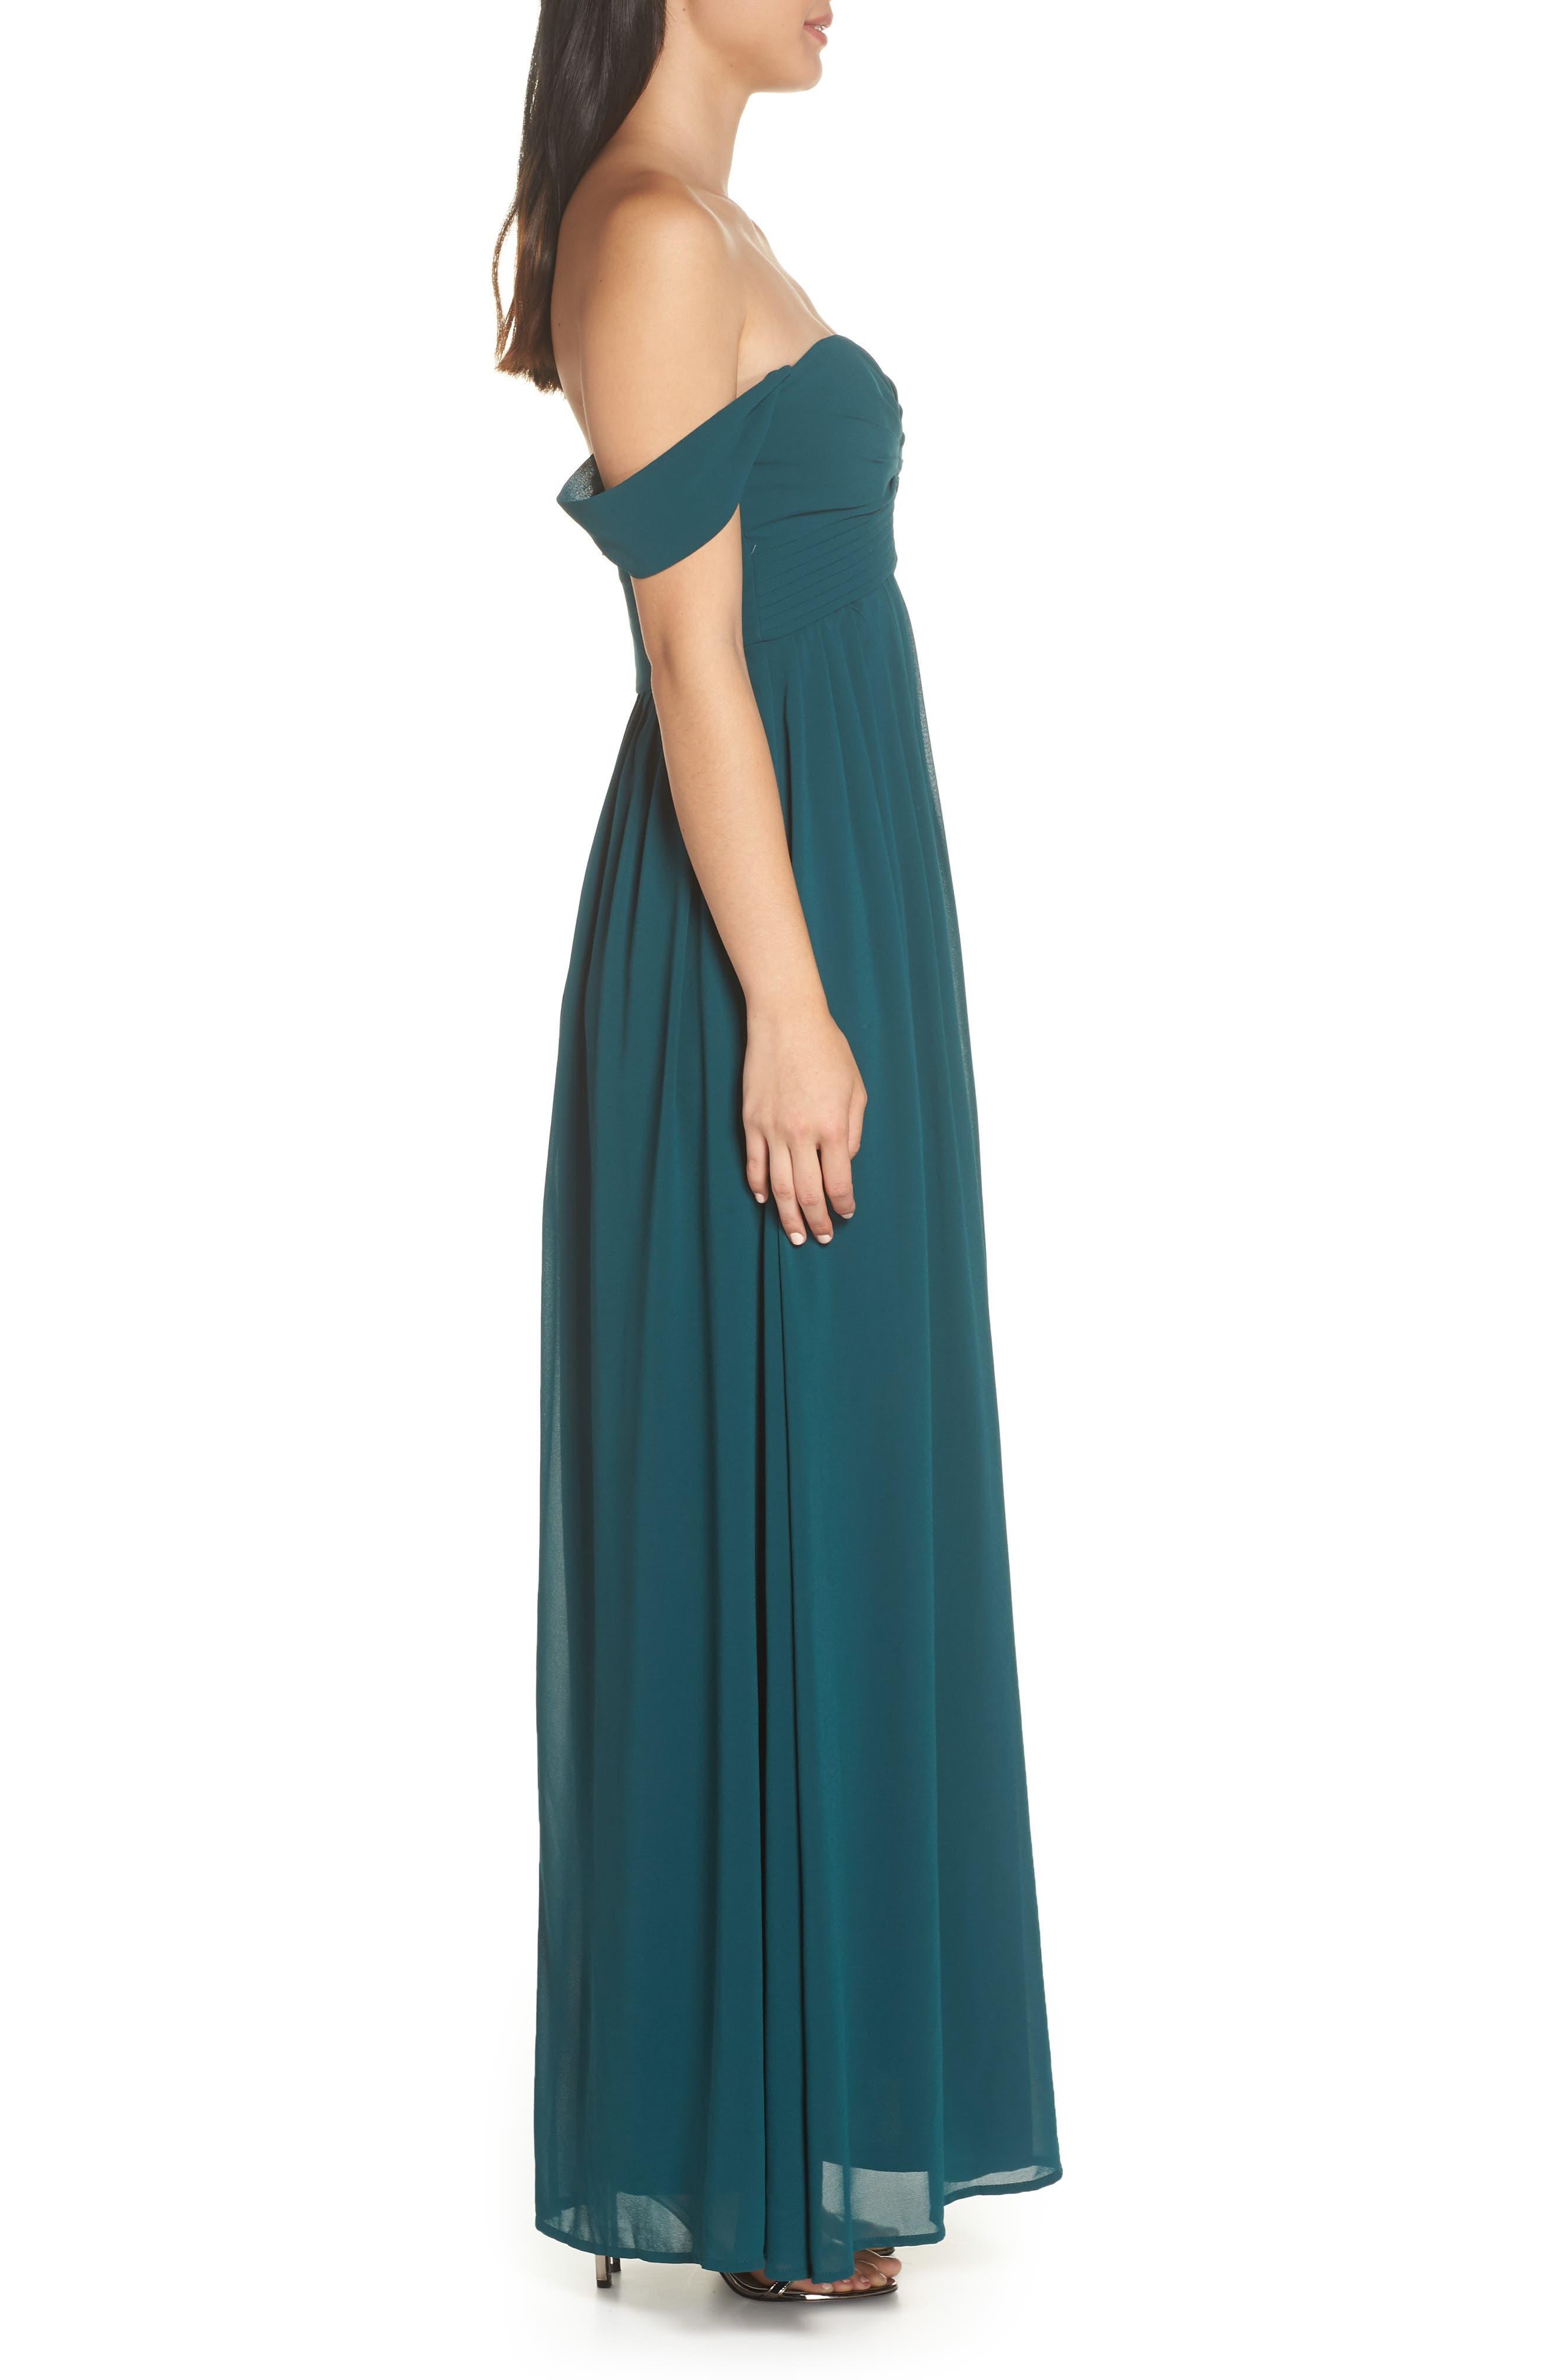 LULUS, Convertible Neckline Chiffon Gown, Alternate thumbnail 3, color, DEEP EMERALD